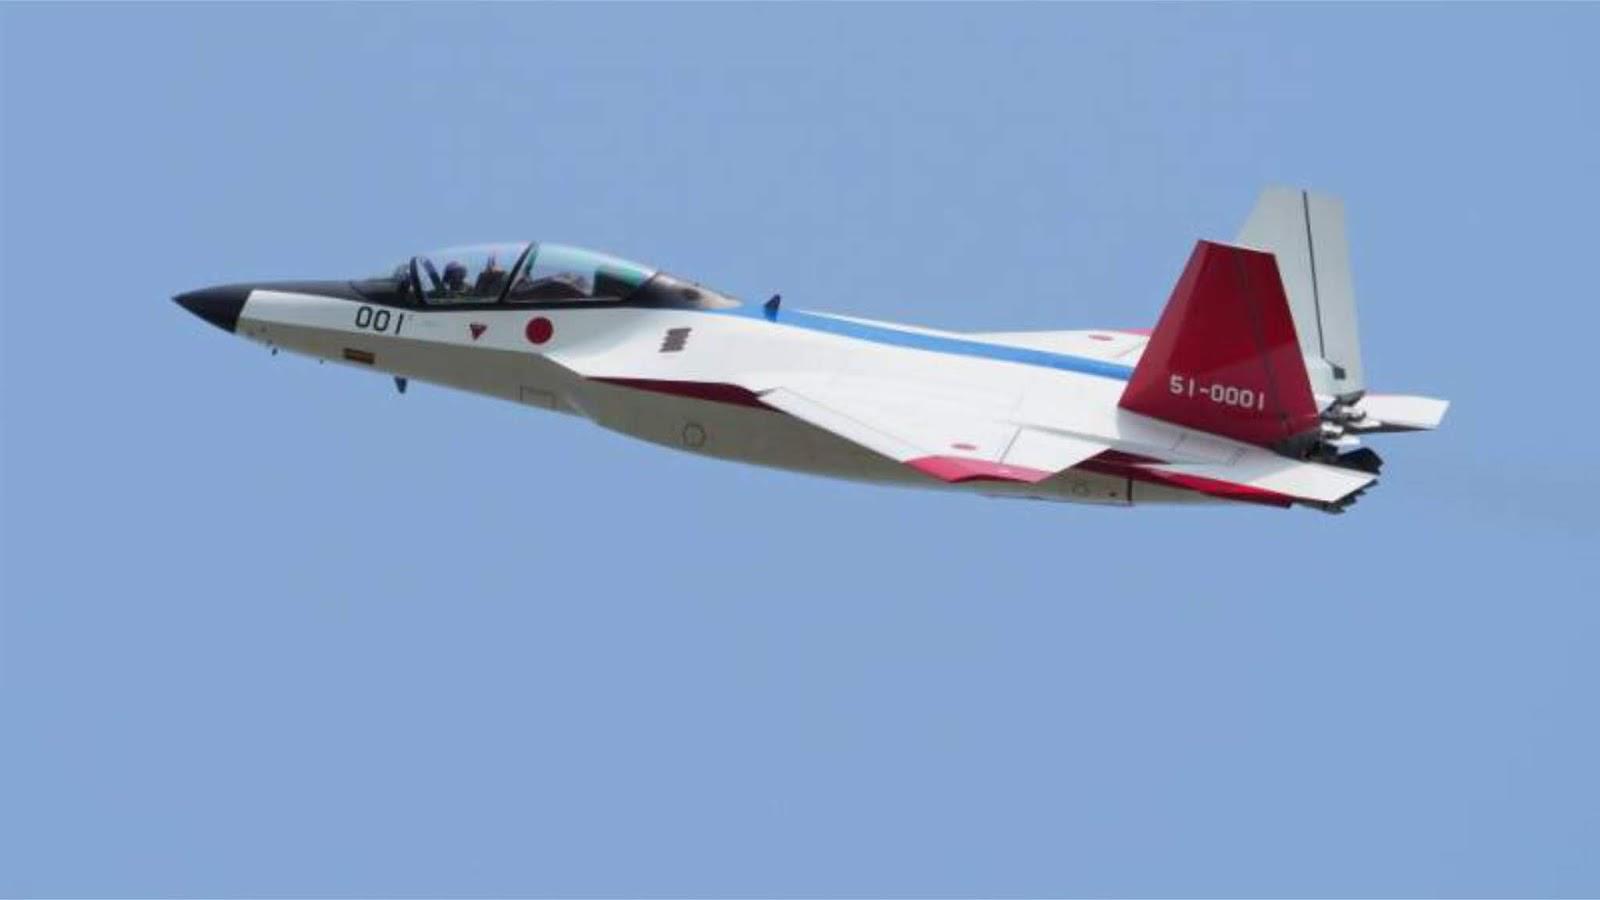 Jepang akan menciptakan pesawat tempur generasi kelimanya sendiri